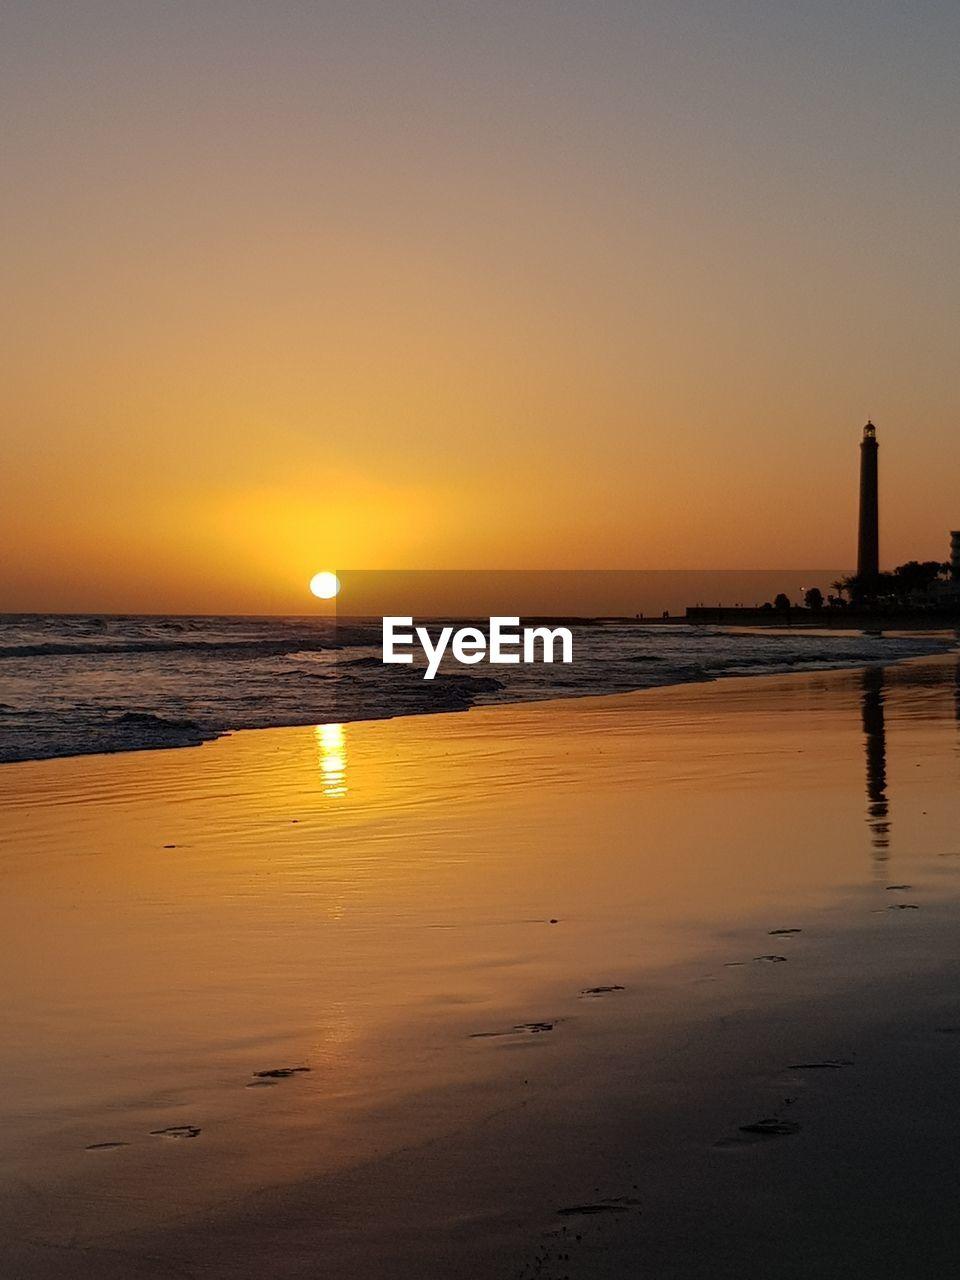 sky, water, sunset, sea, beauty in nature, scenics - nature, orange color, tranquility, beach, land, reflection, tranquil scene, sun, idyllic, nature, horizon, horizon over water, no people, non-urban scene, outdoors